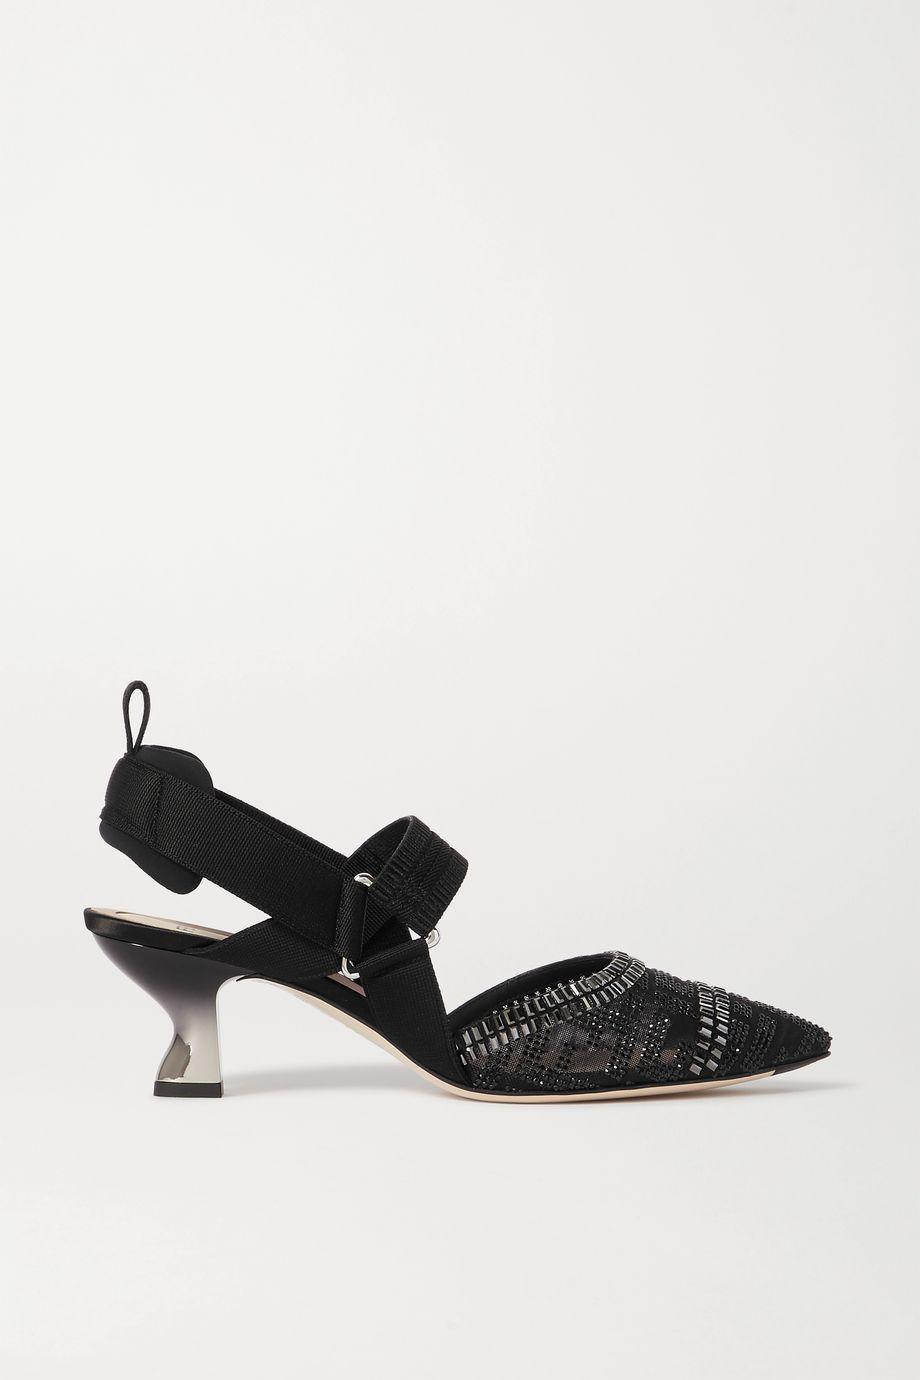 Fendi Colibrì embellished mesh, rubber and stretch-canvas slingback pumps